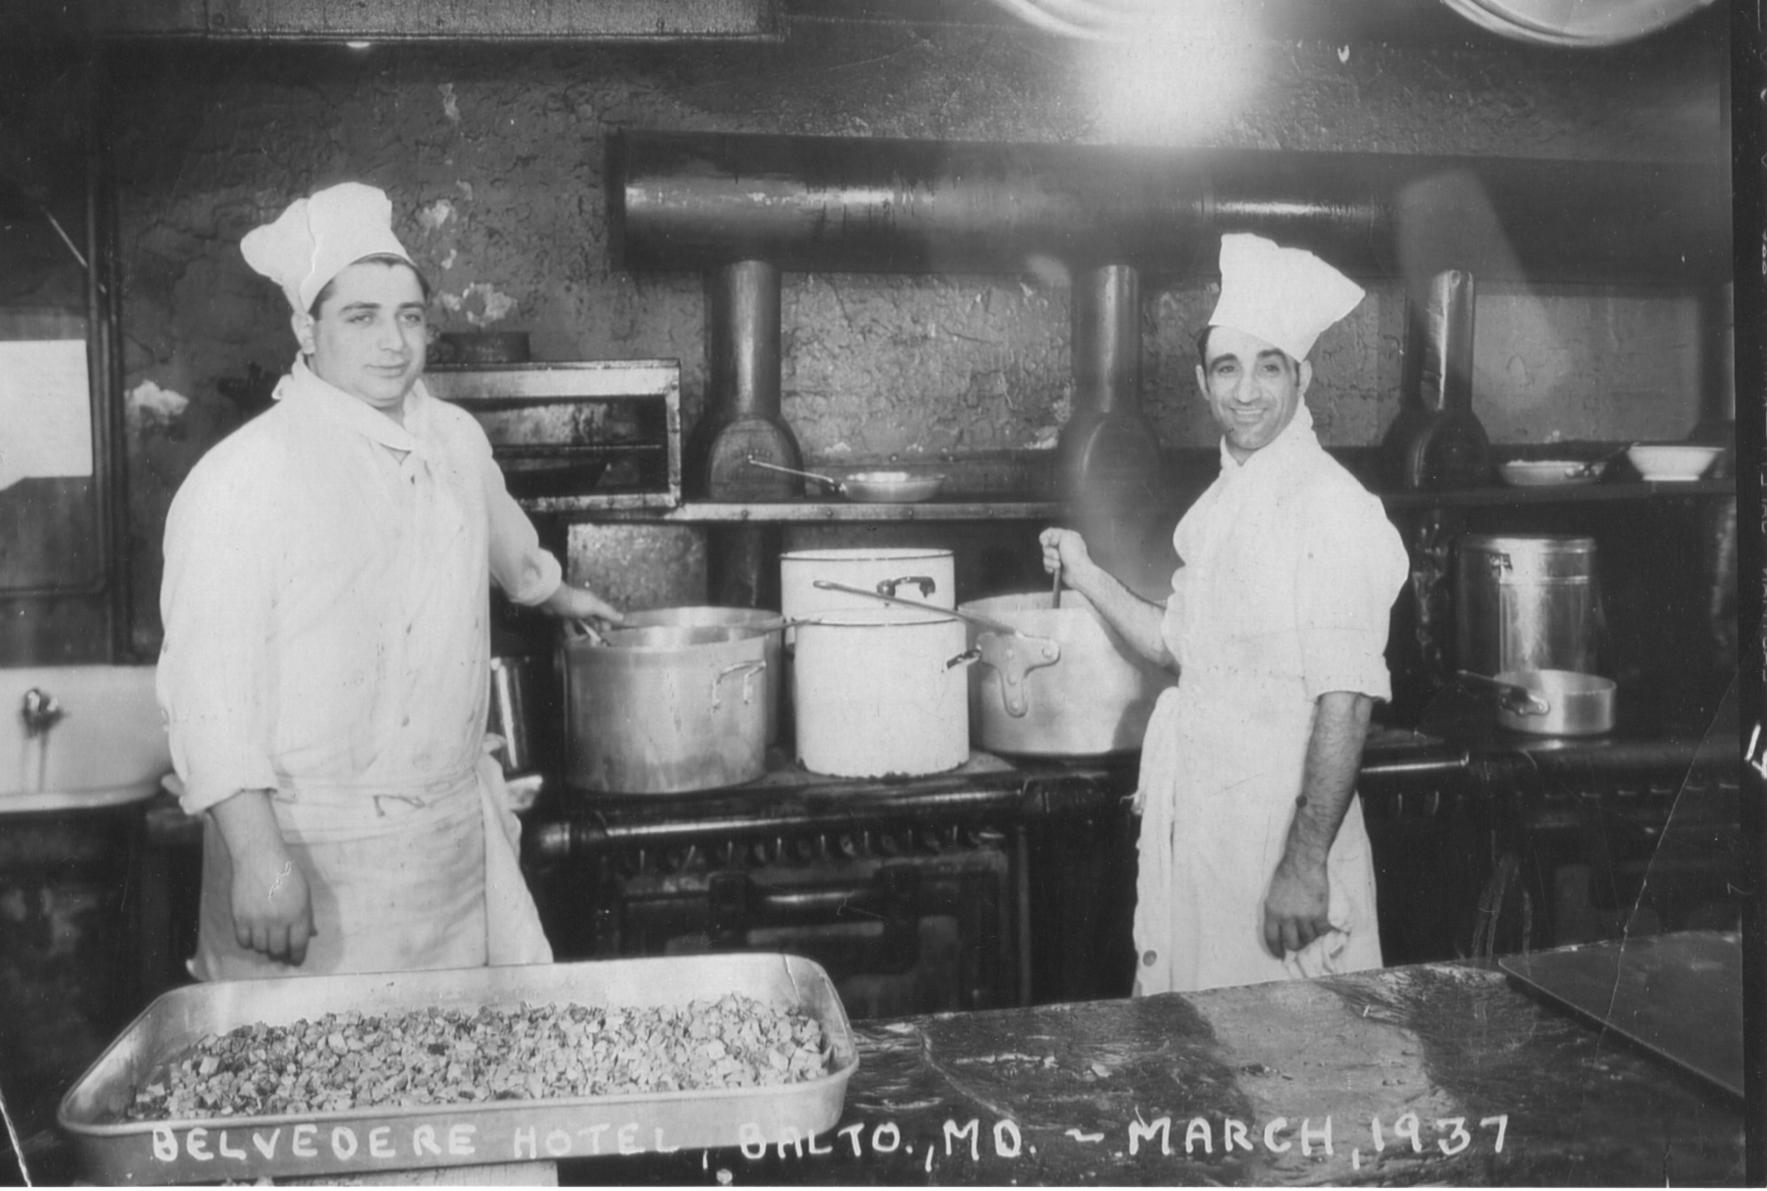 Attilio Spensatelli, Belvedere Hotel, March 1937